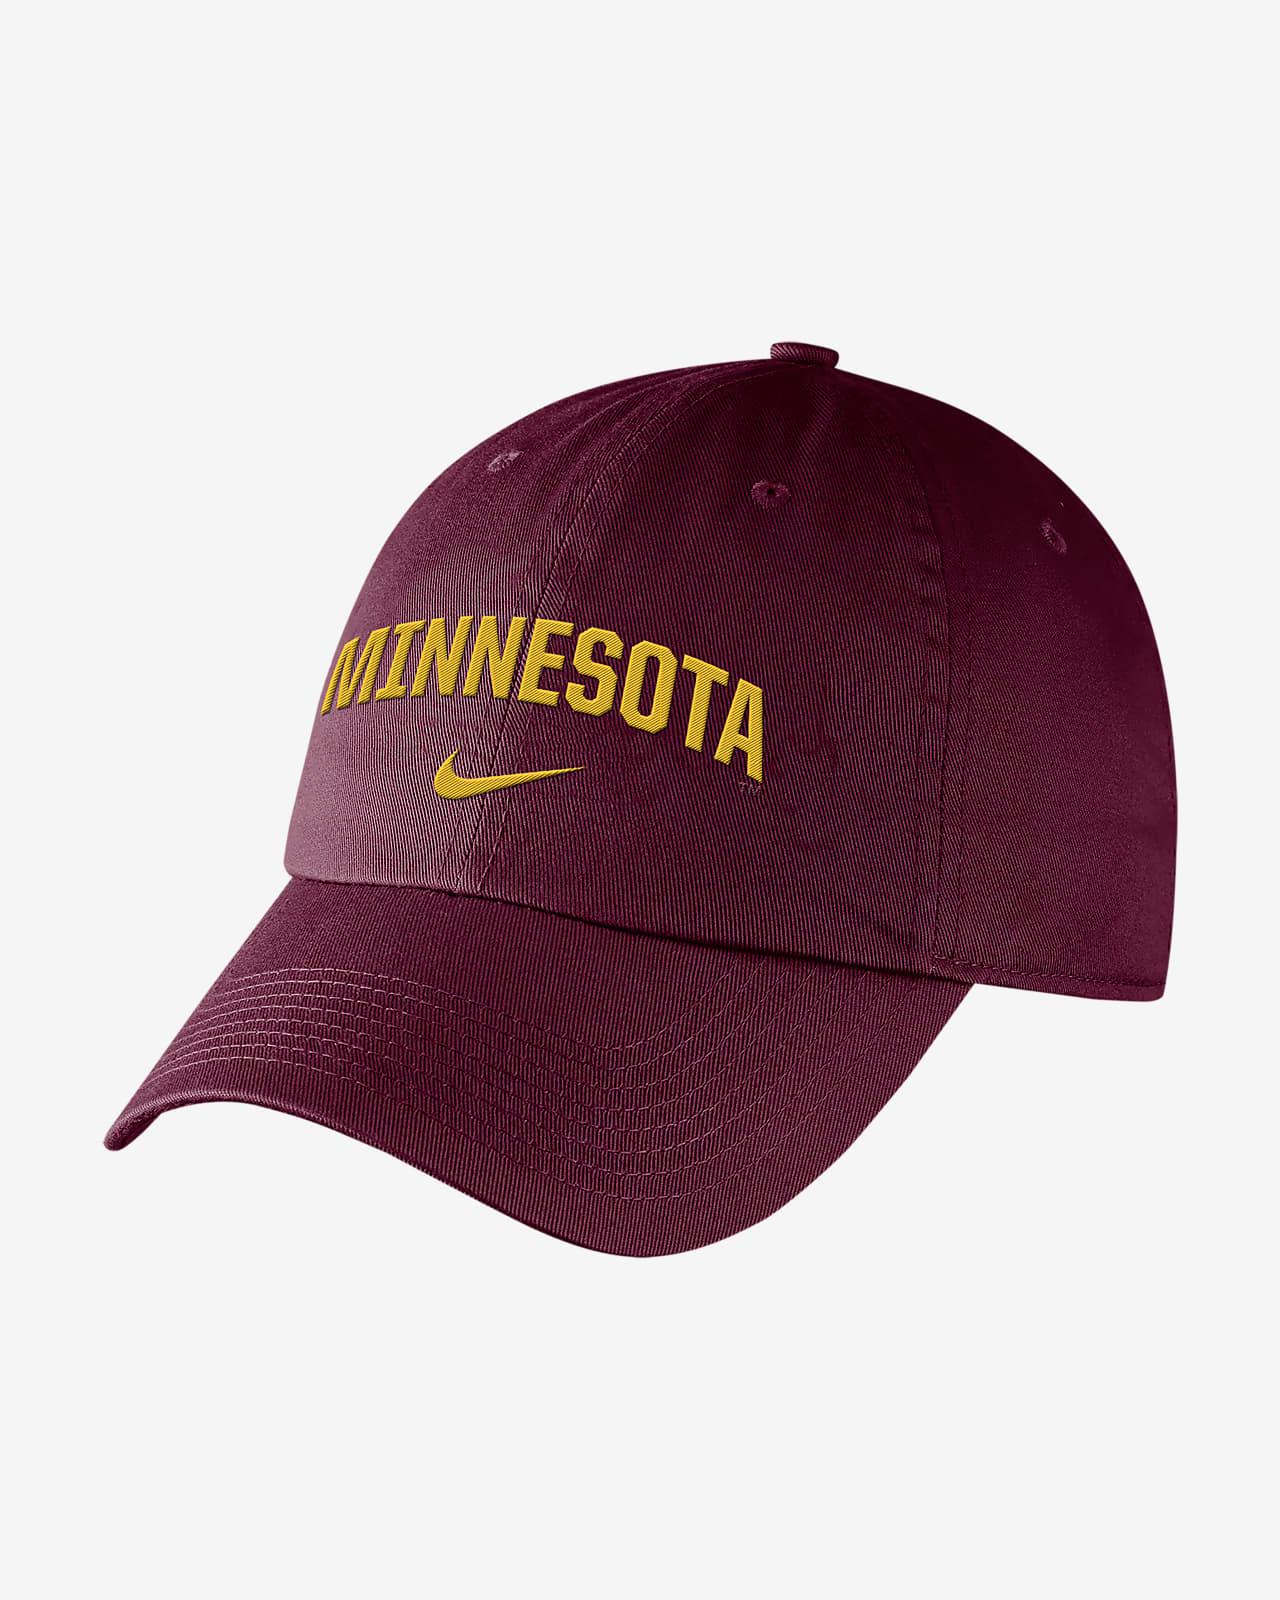 Nike College (Minnesota) Hat